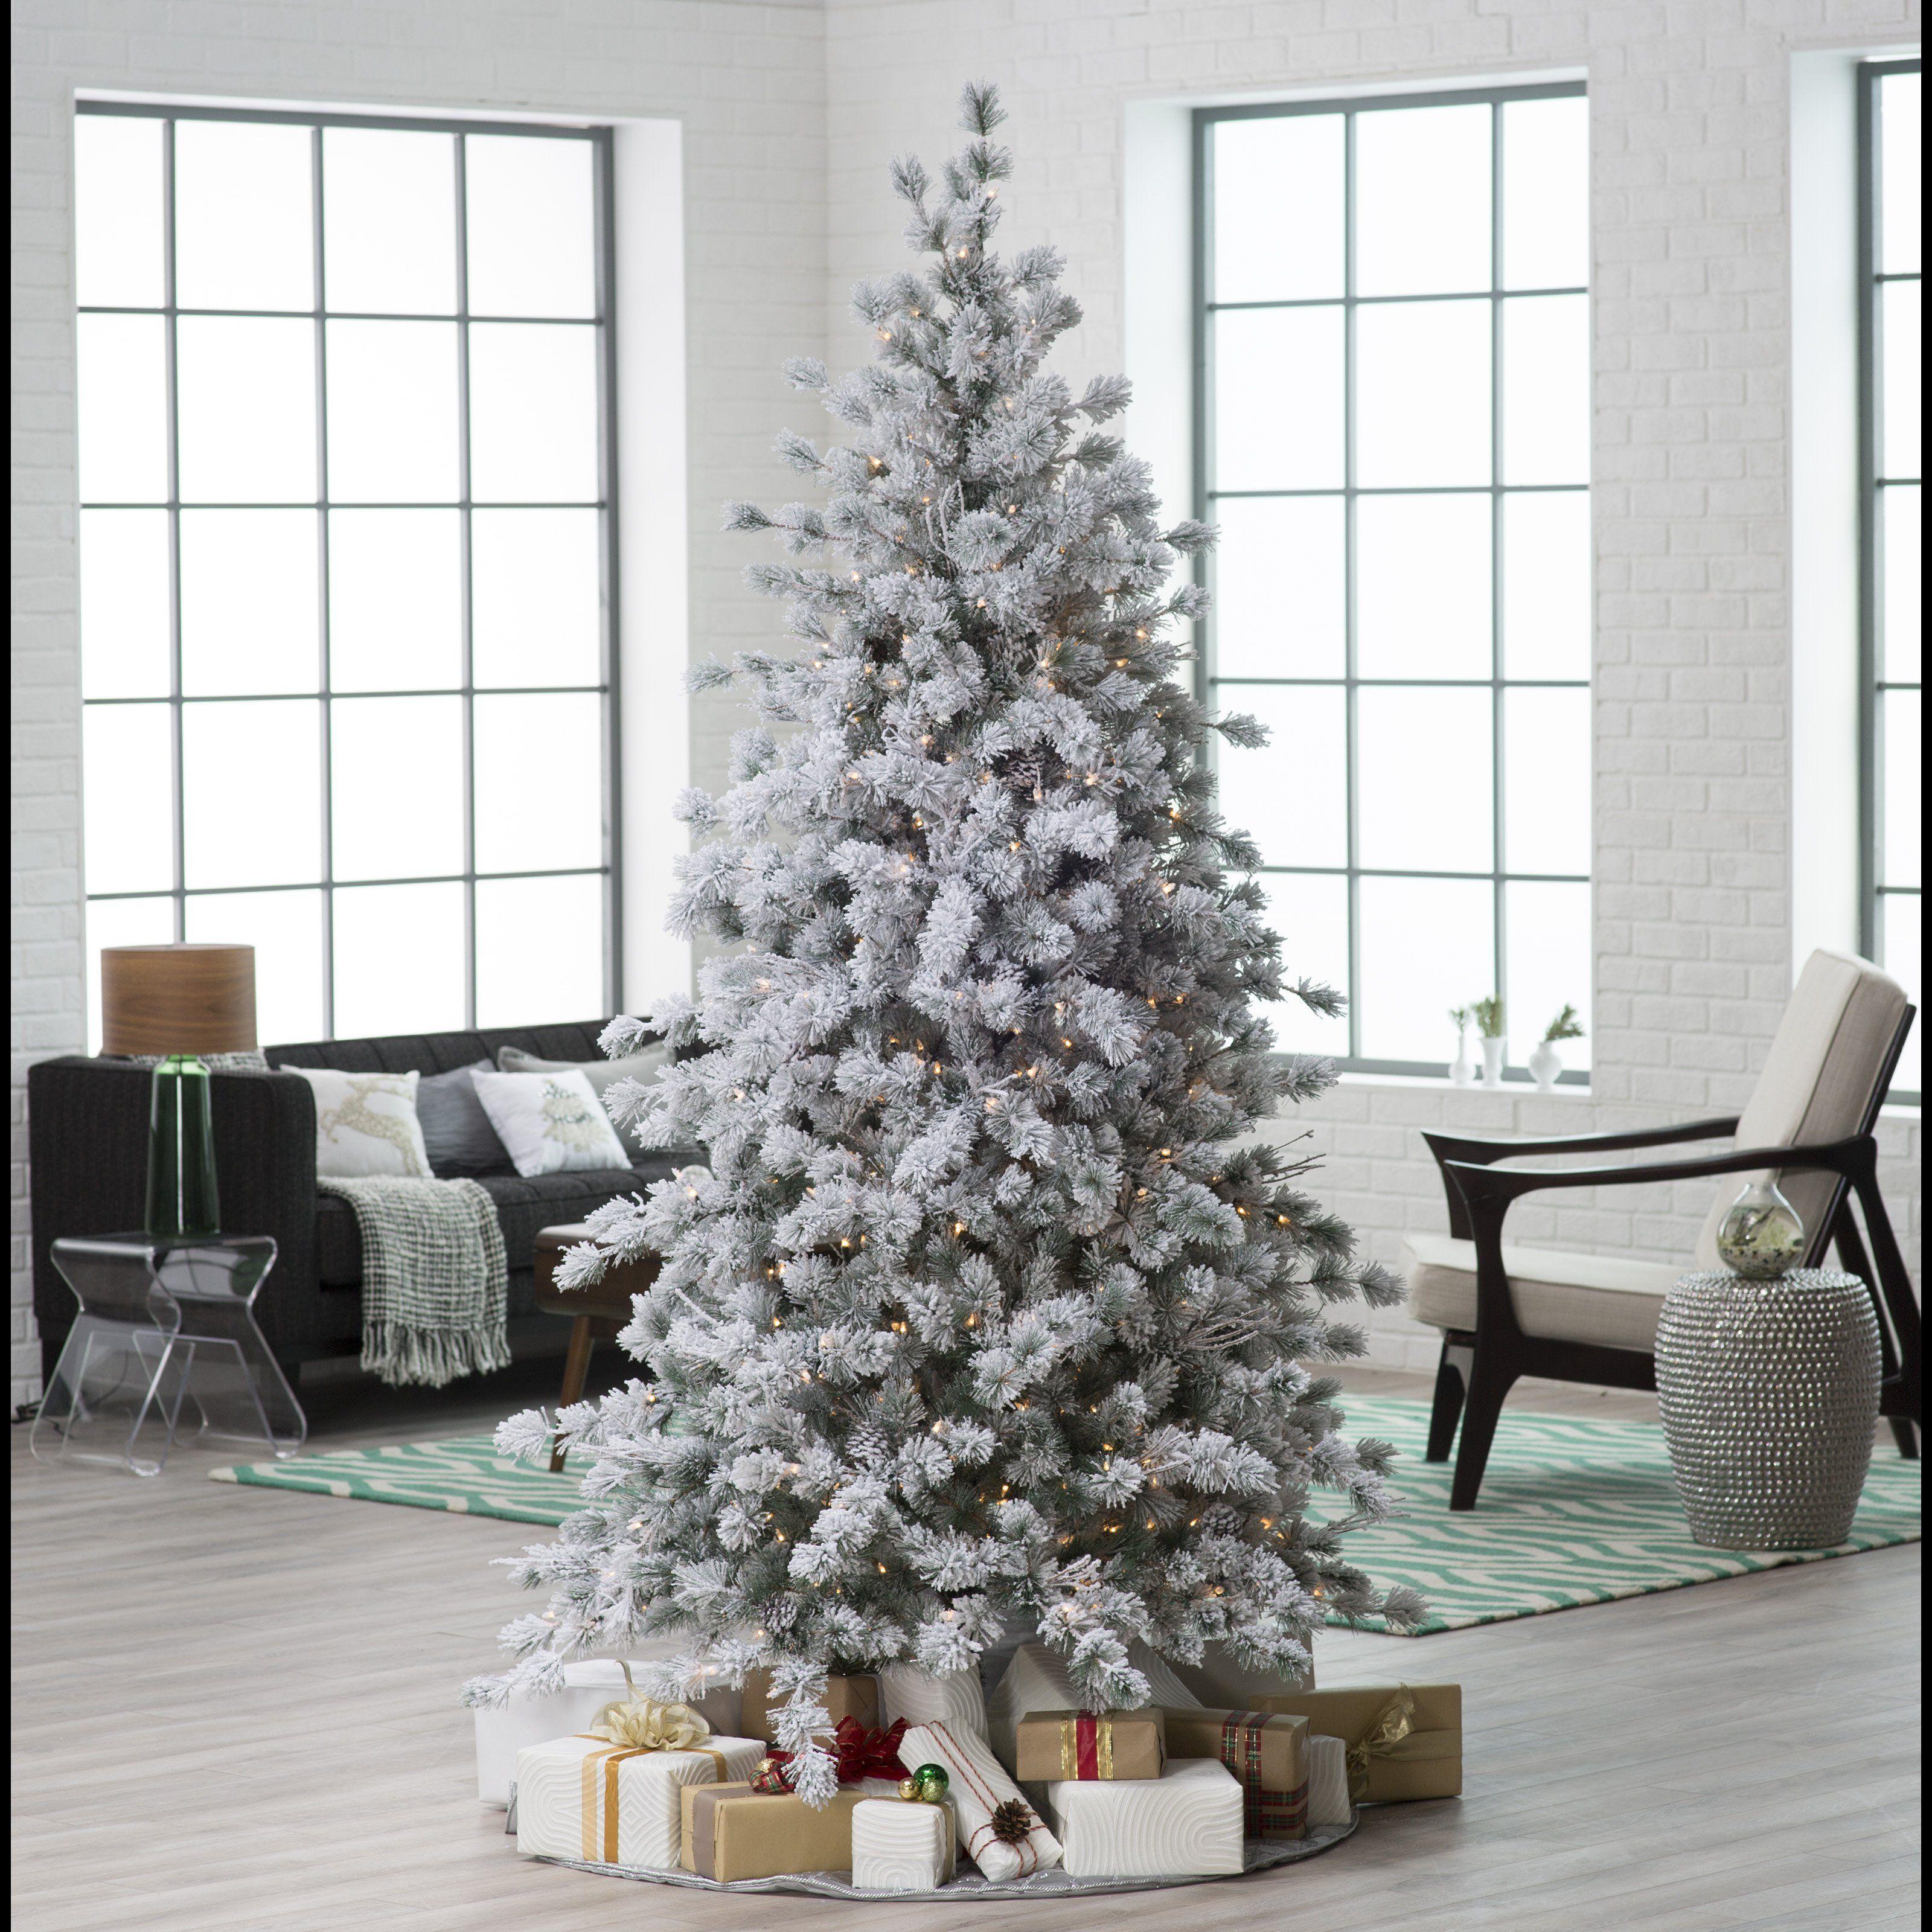 7 5 Ft Pre Lit Flocked Hard Needle Huntsville Pine Christmas Tree With Pinecones Am Www Haynee Pine Christmas Tree Christmas Tree Pre Lit Christmas Tree